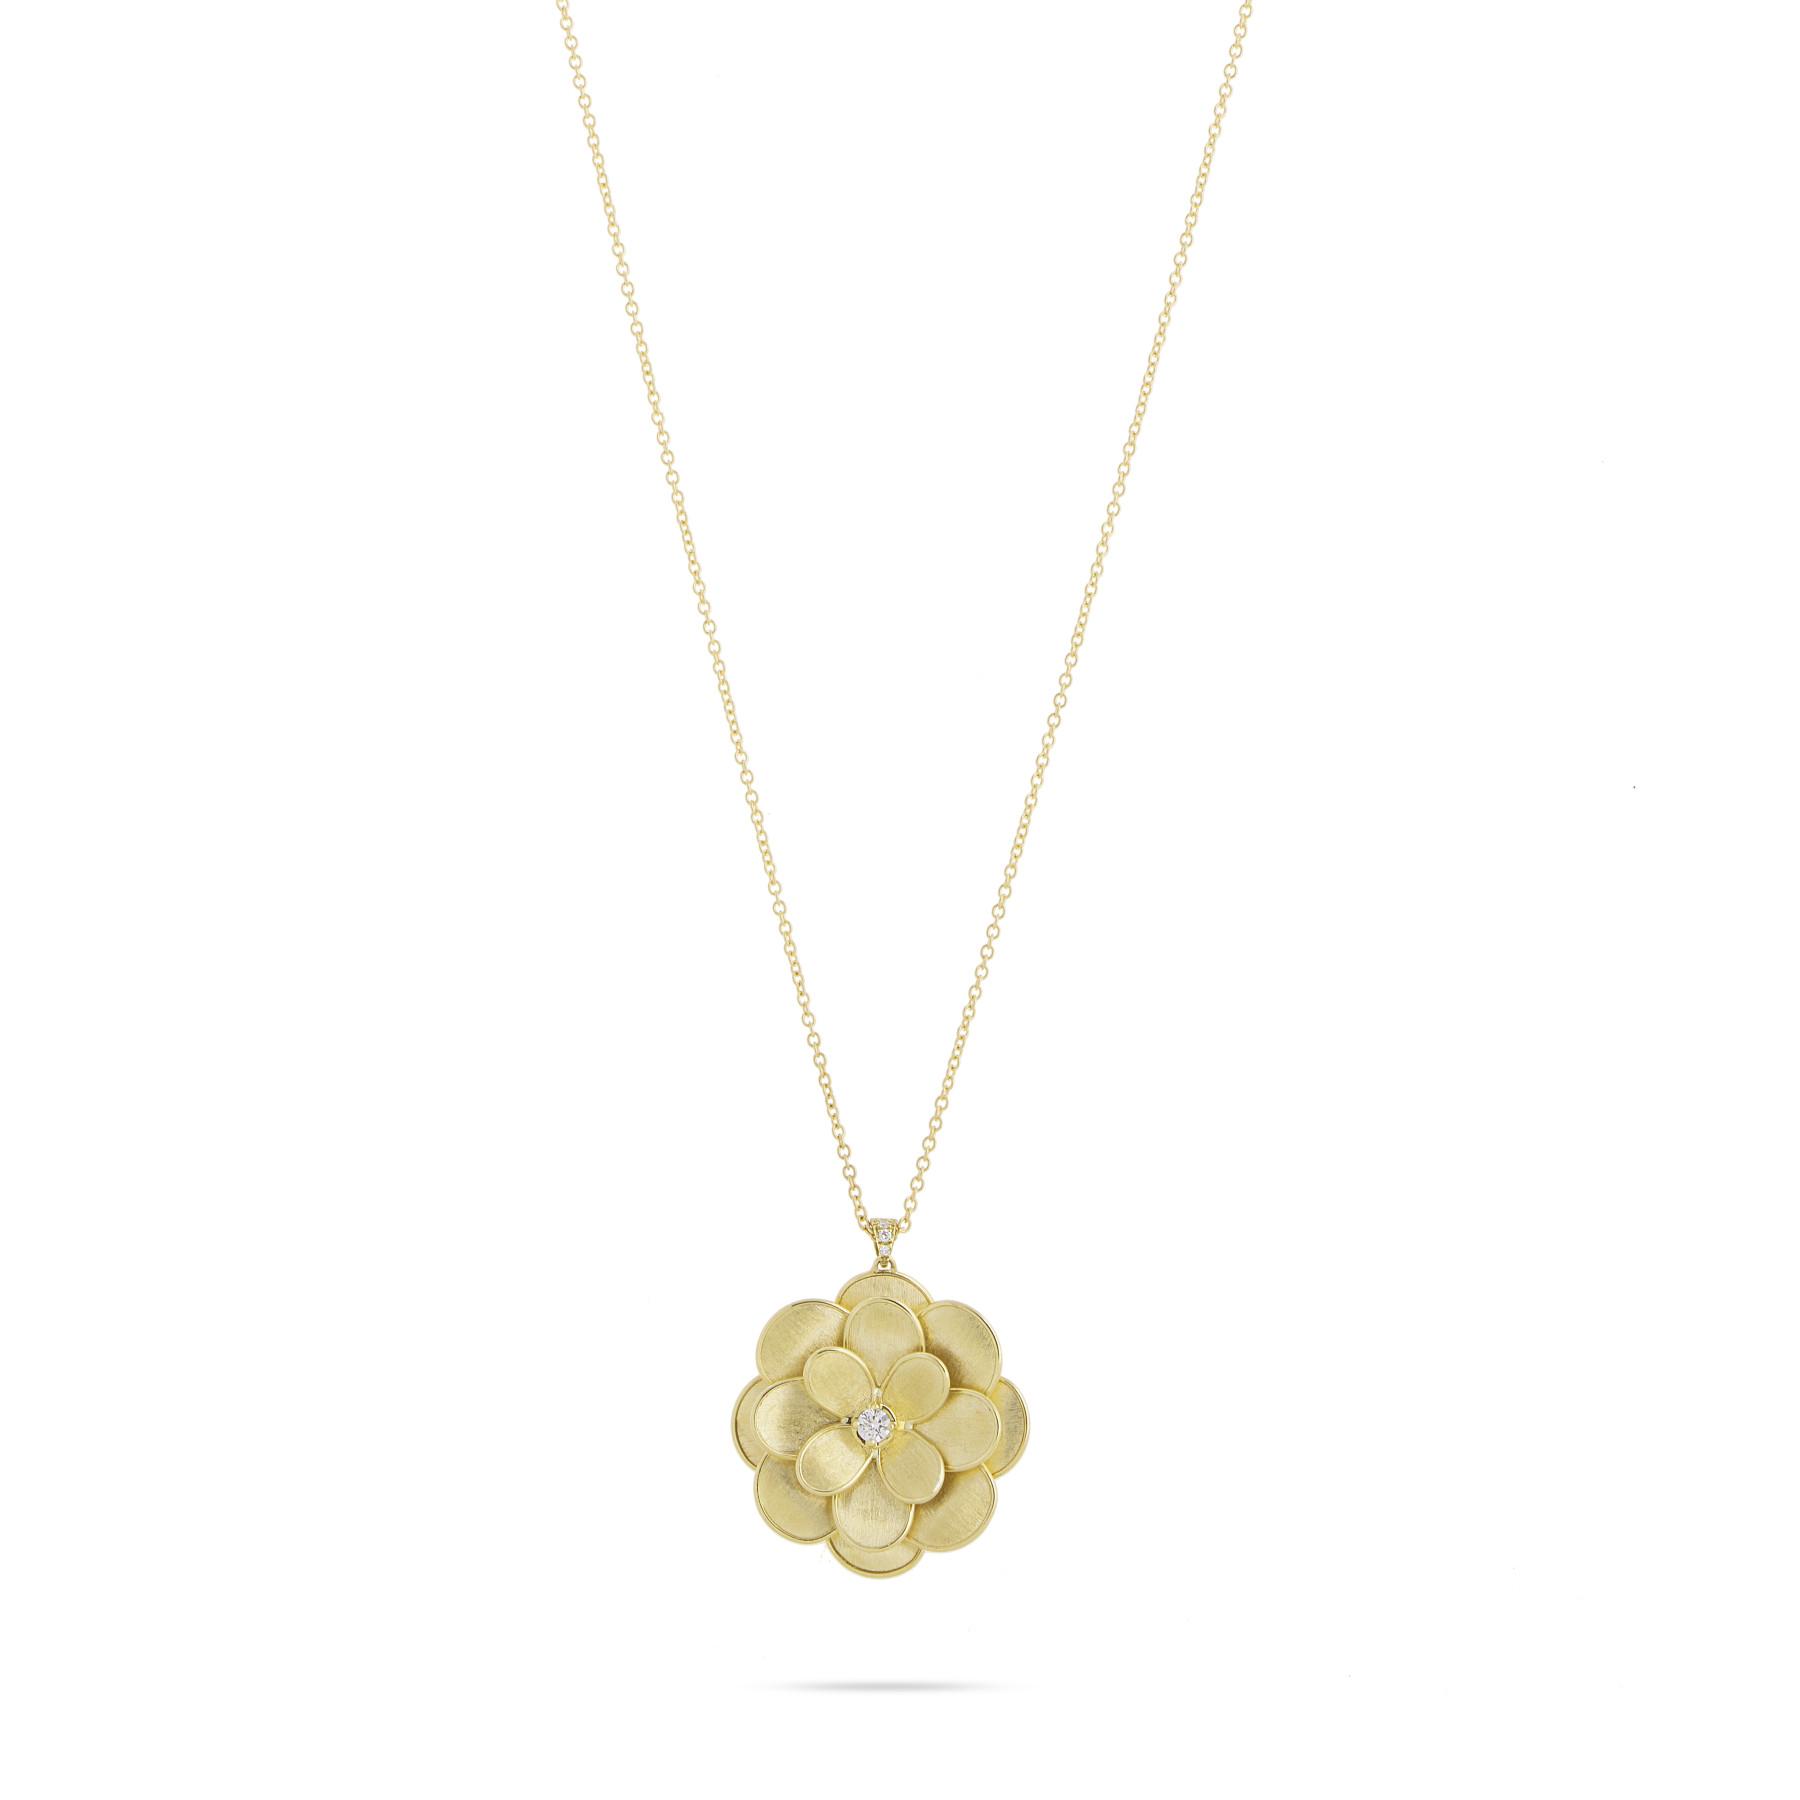 Marco Bicego Petali Gold Flower Necklace